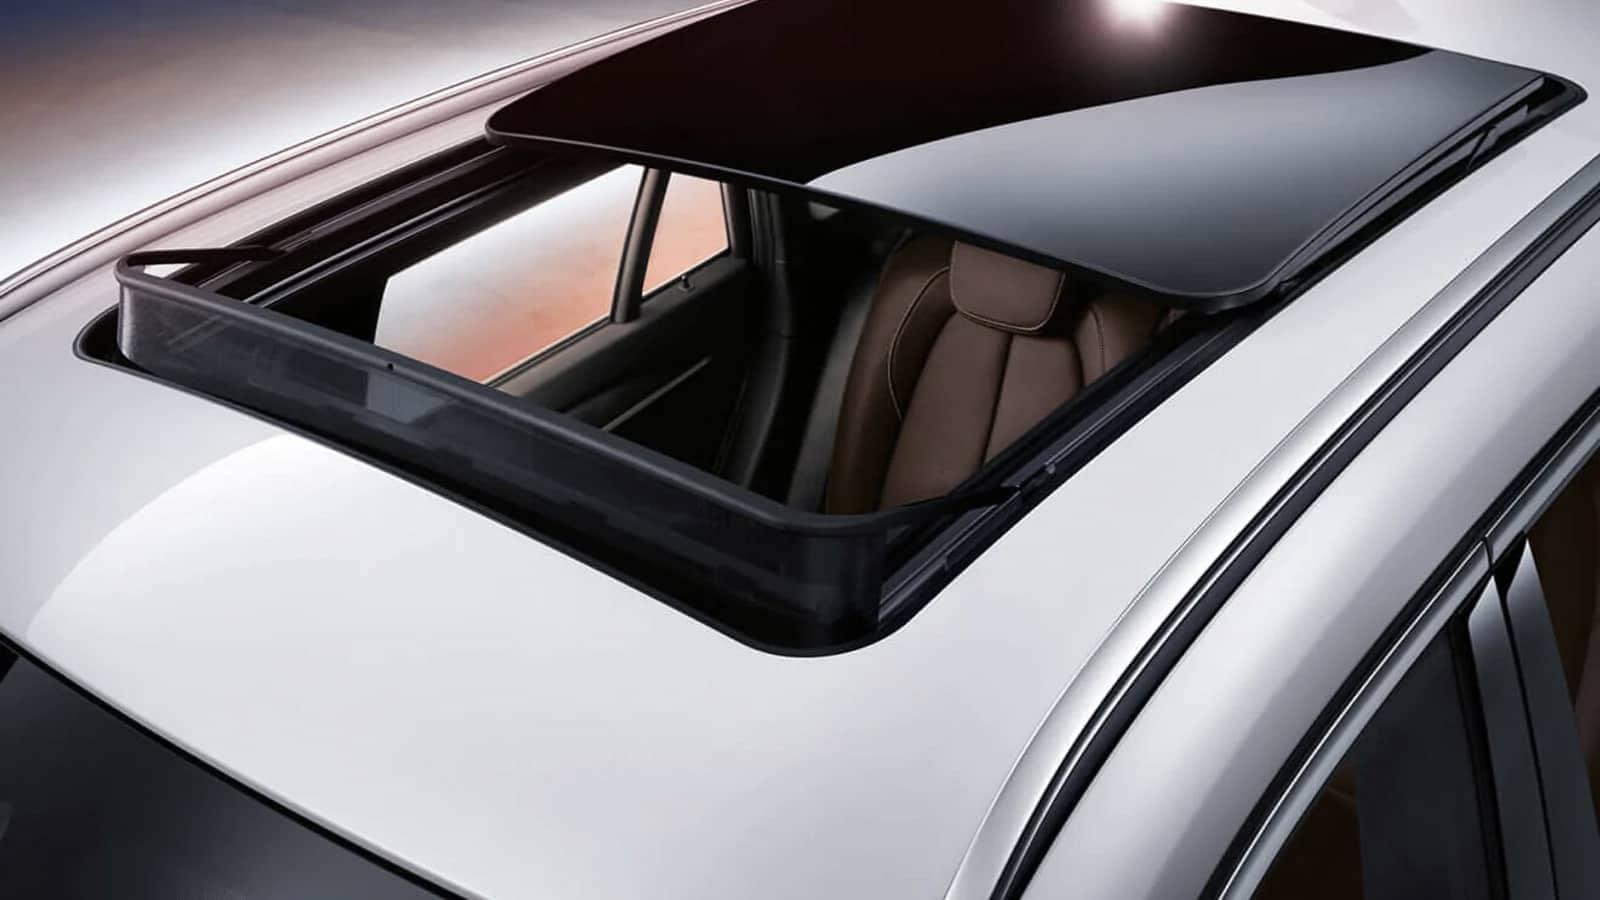 2019 BMW X1 panoramic moonroof